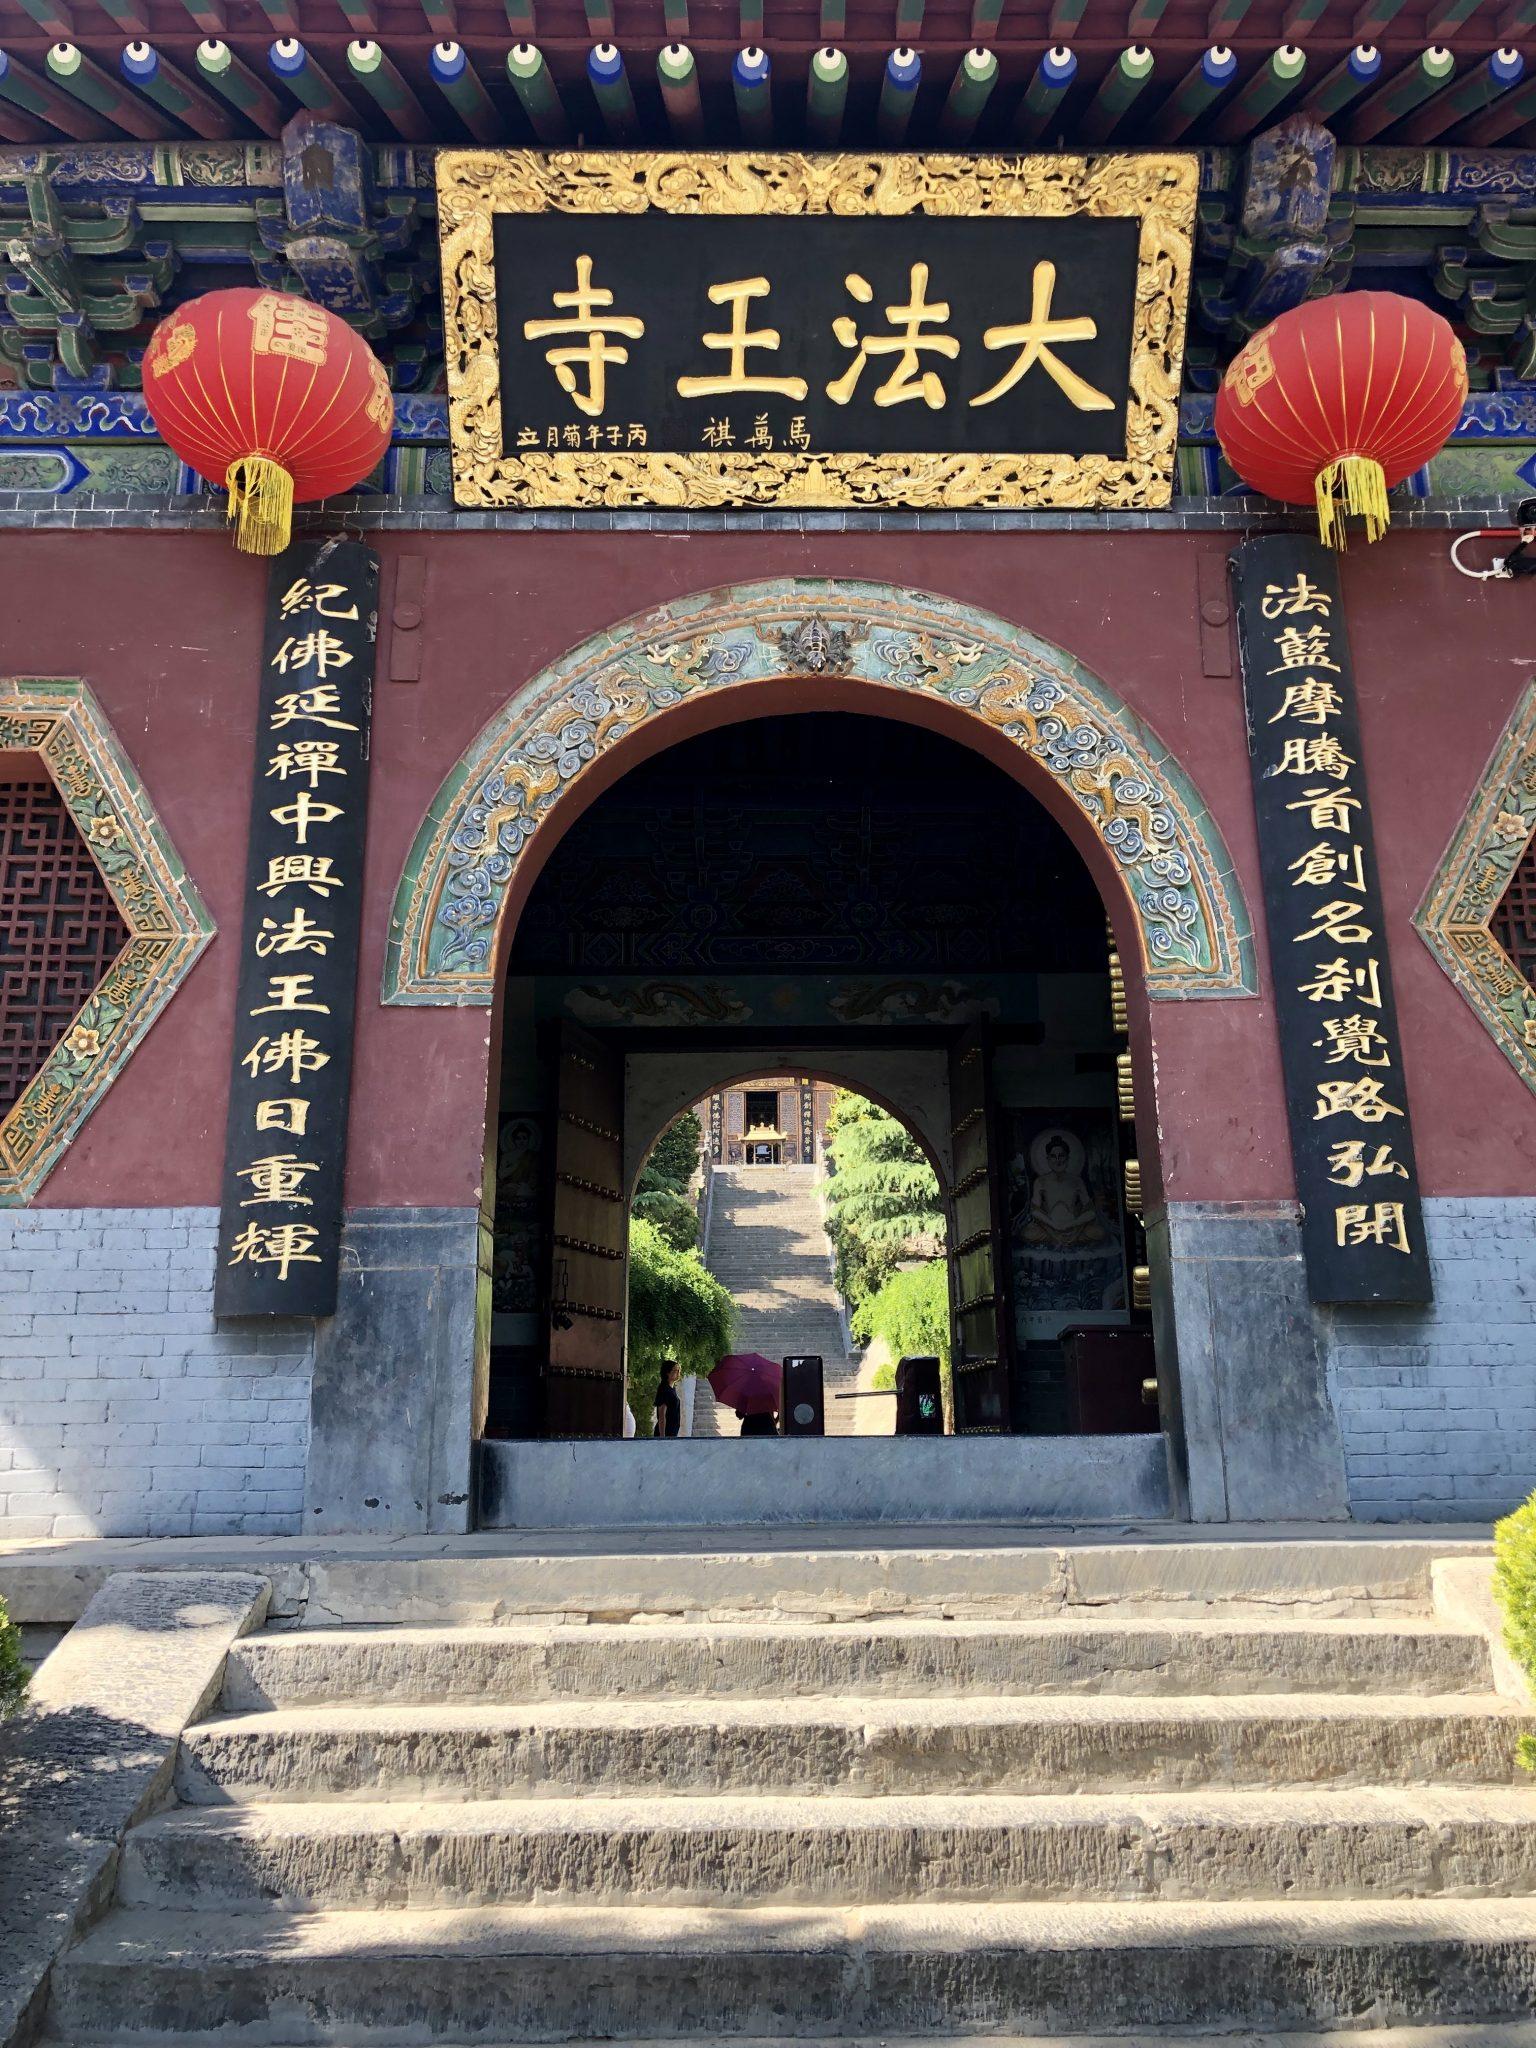 Kung Fu shaolin